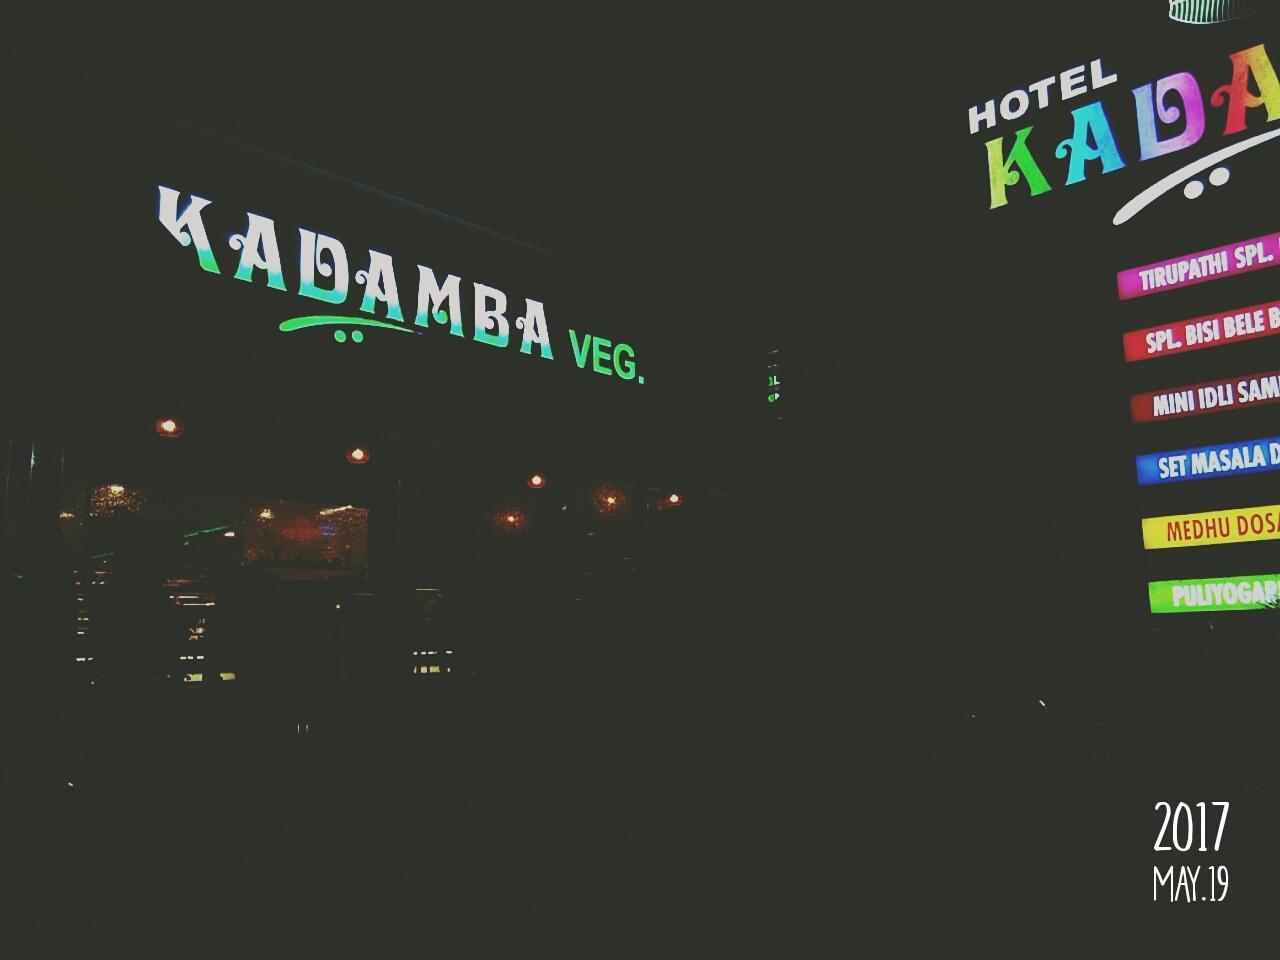 Hotel Kadamba